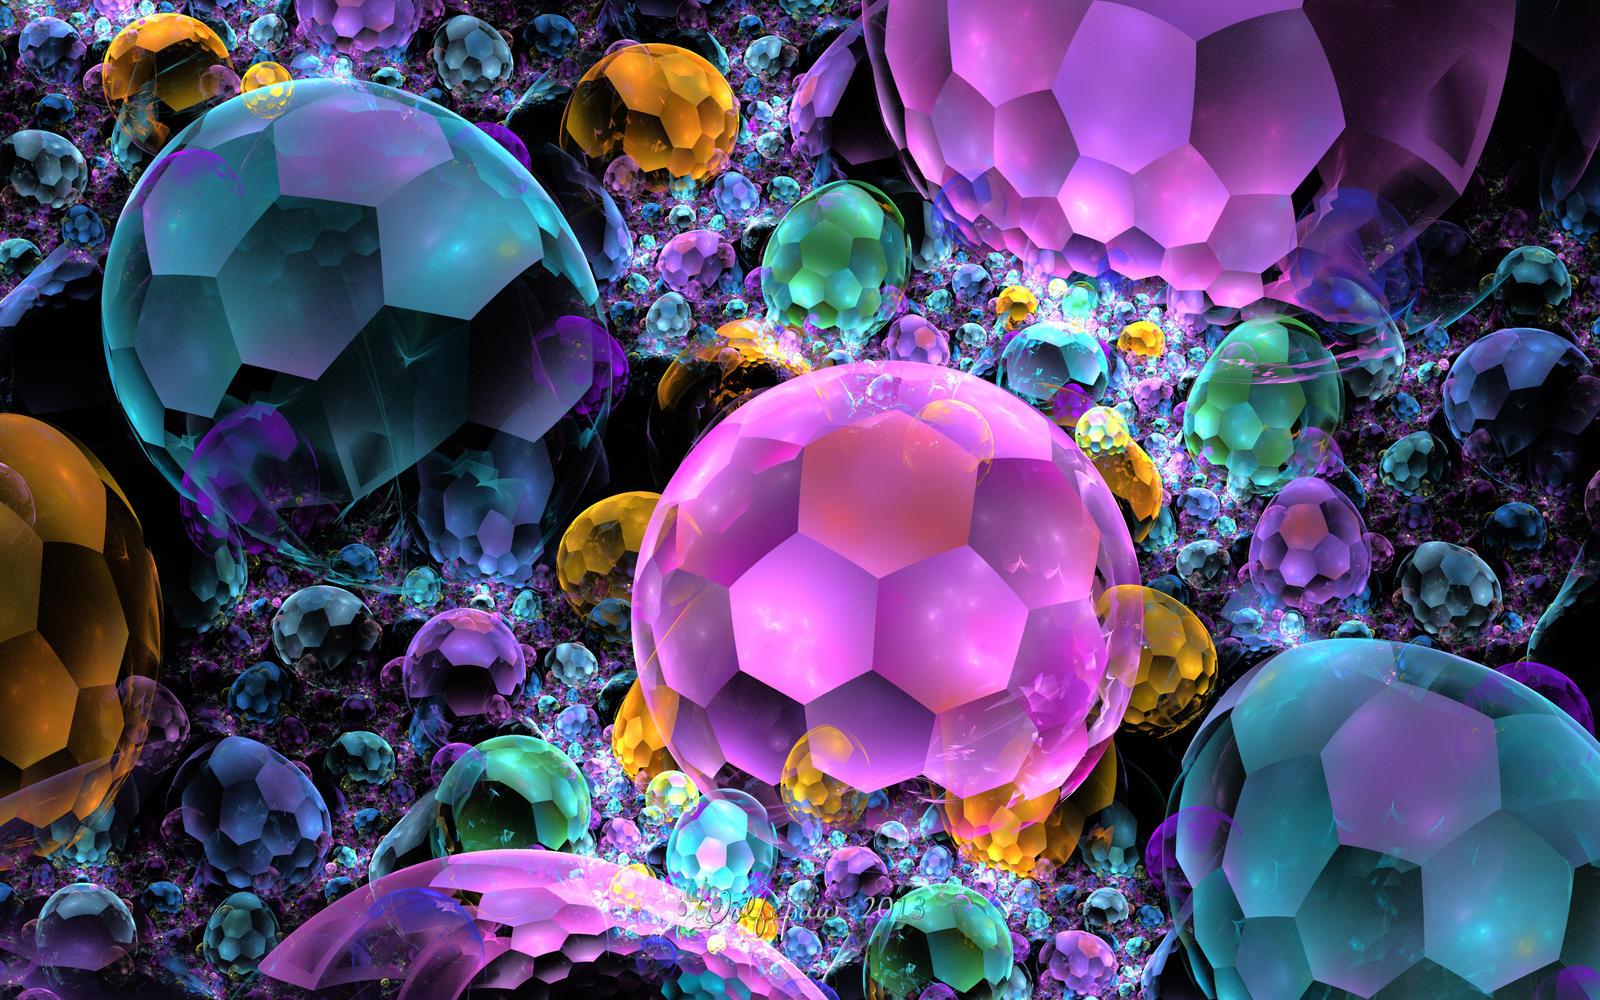 Bubble Gems by wolfepaw